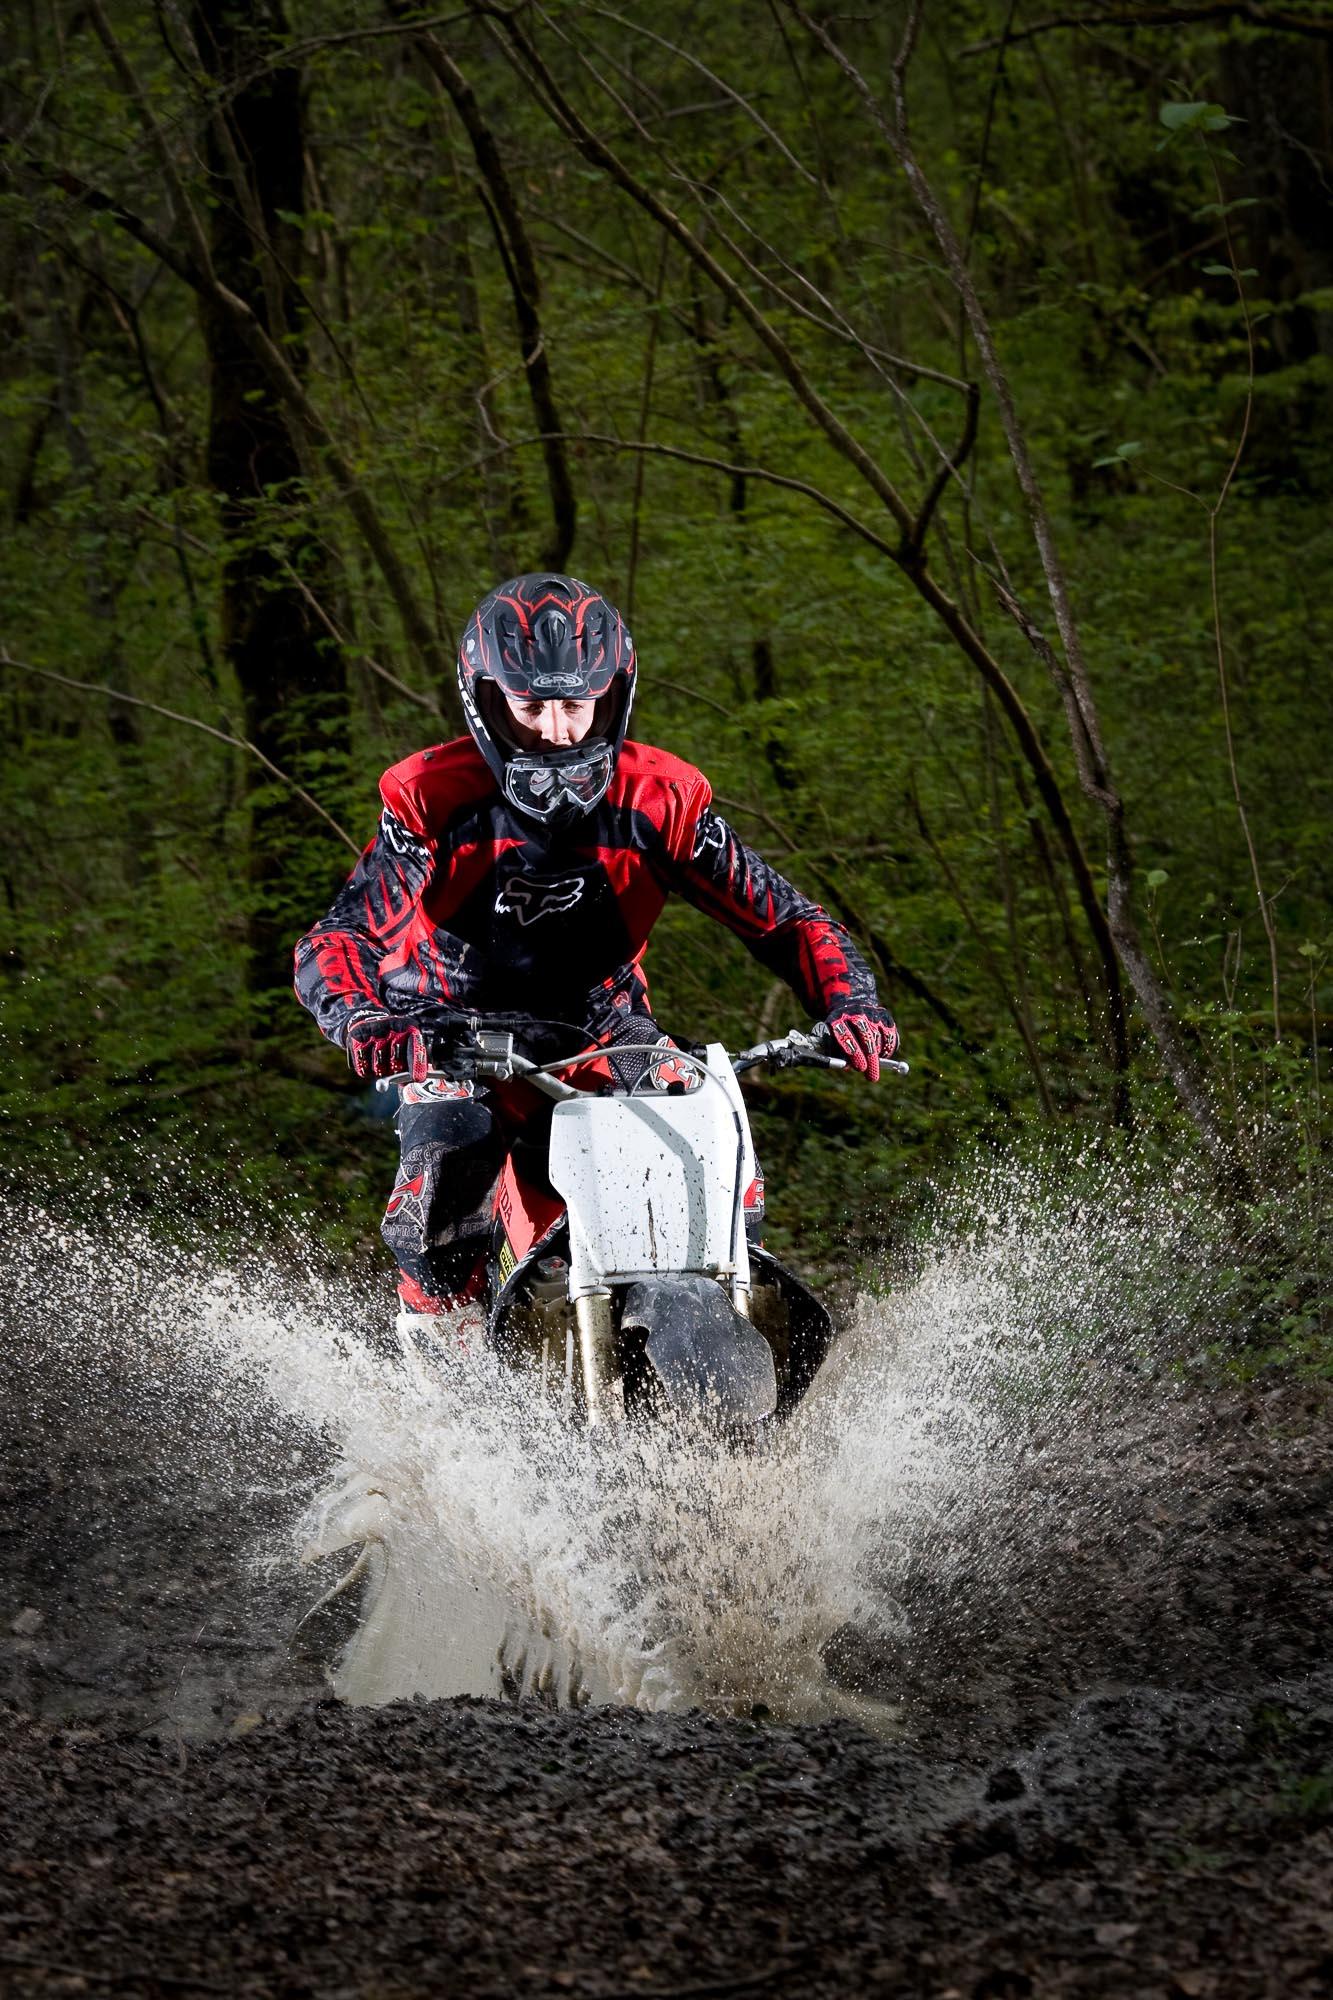 20100425-motos yvoire-5.jpg